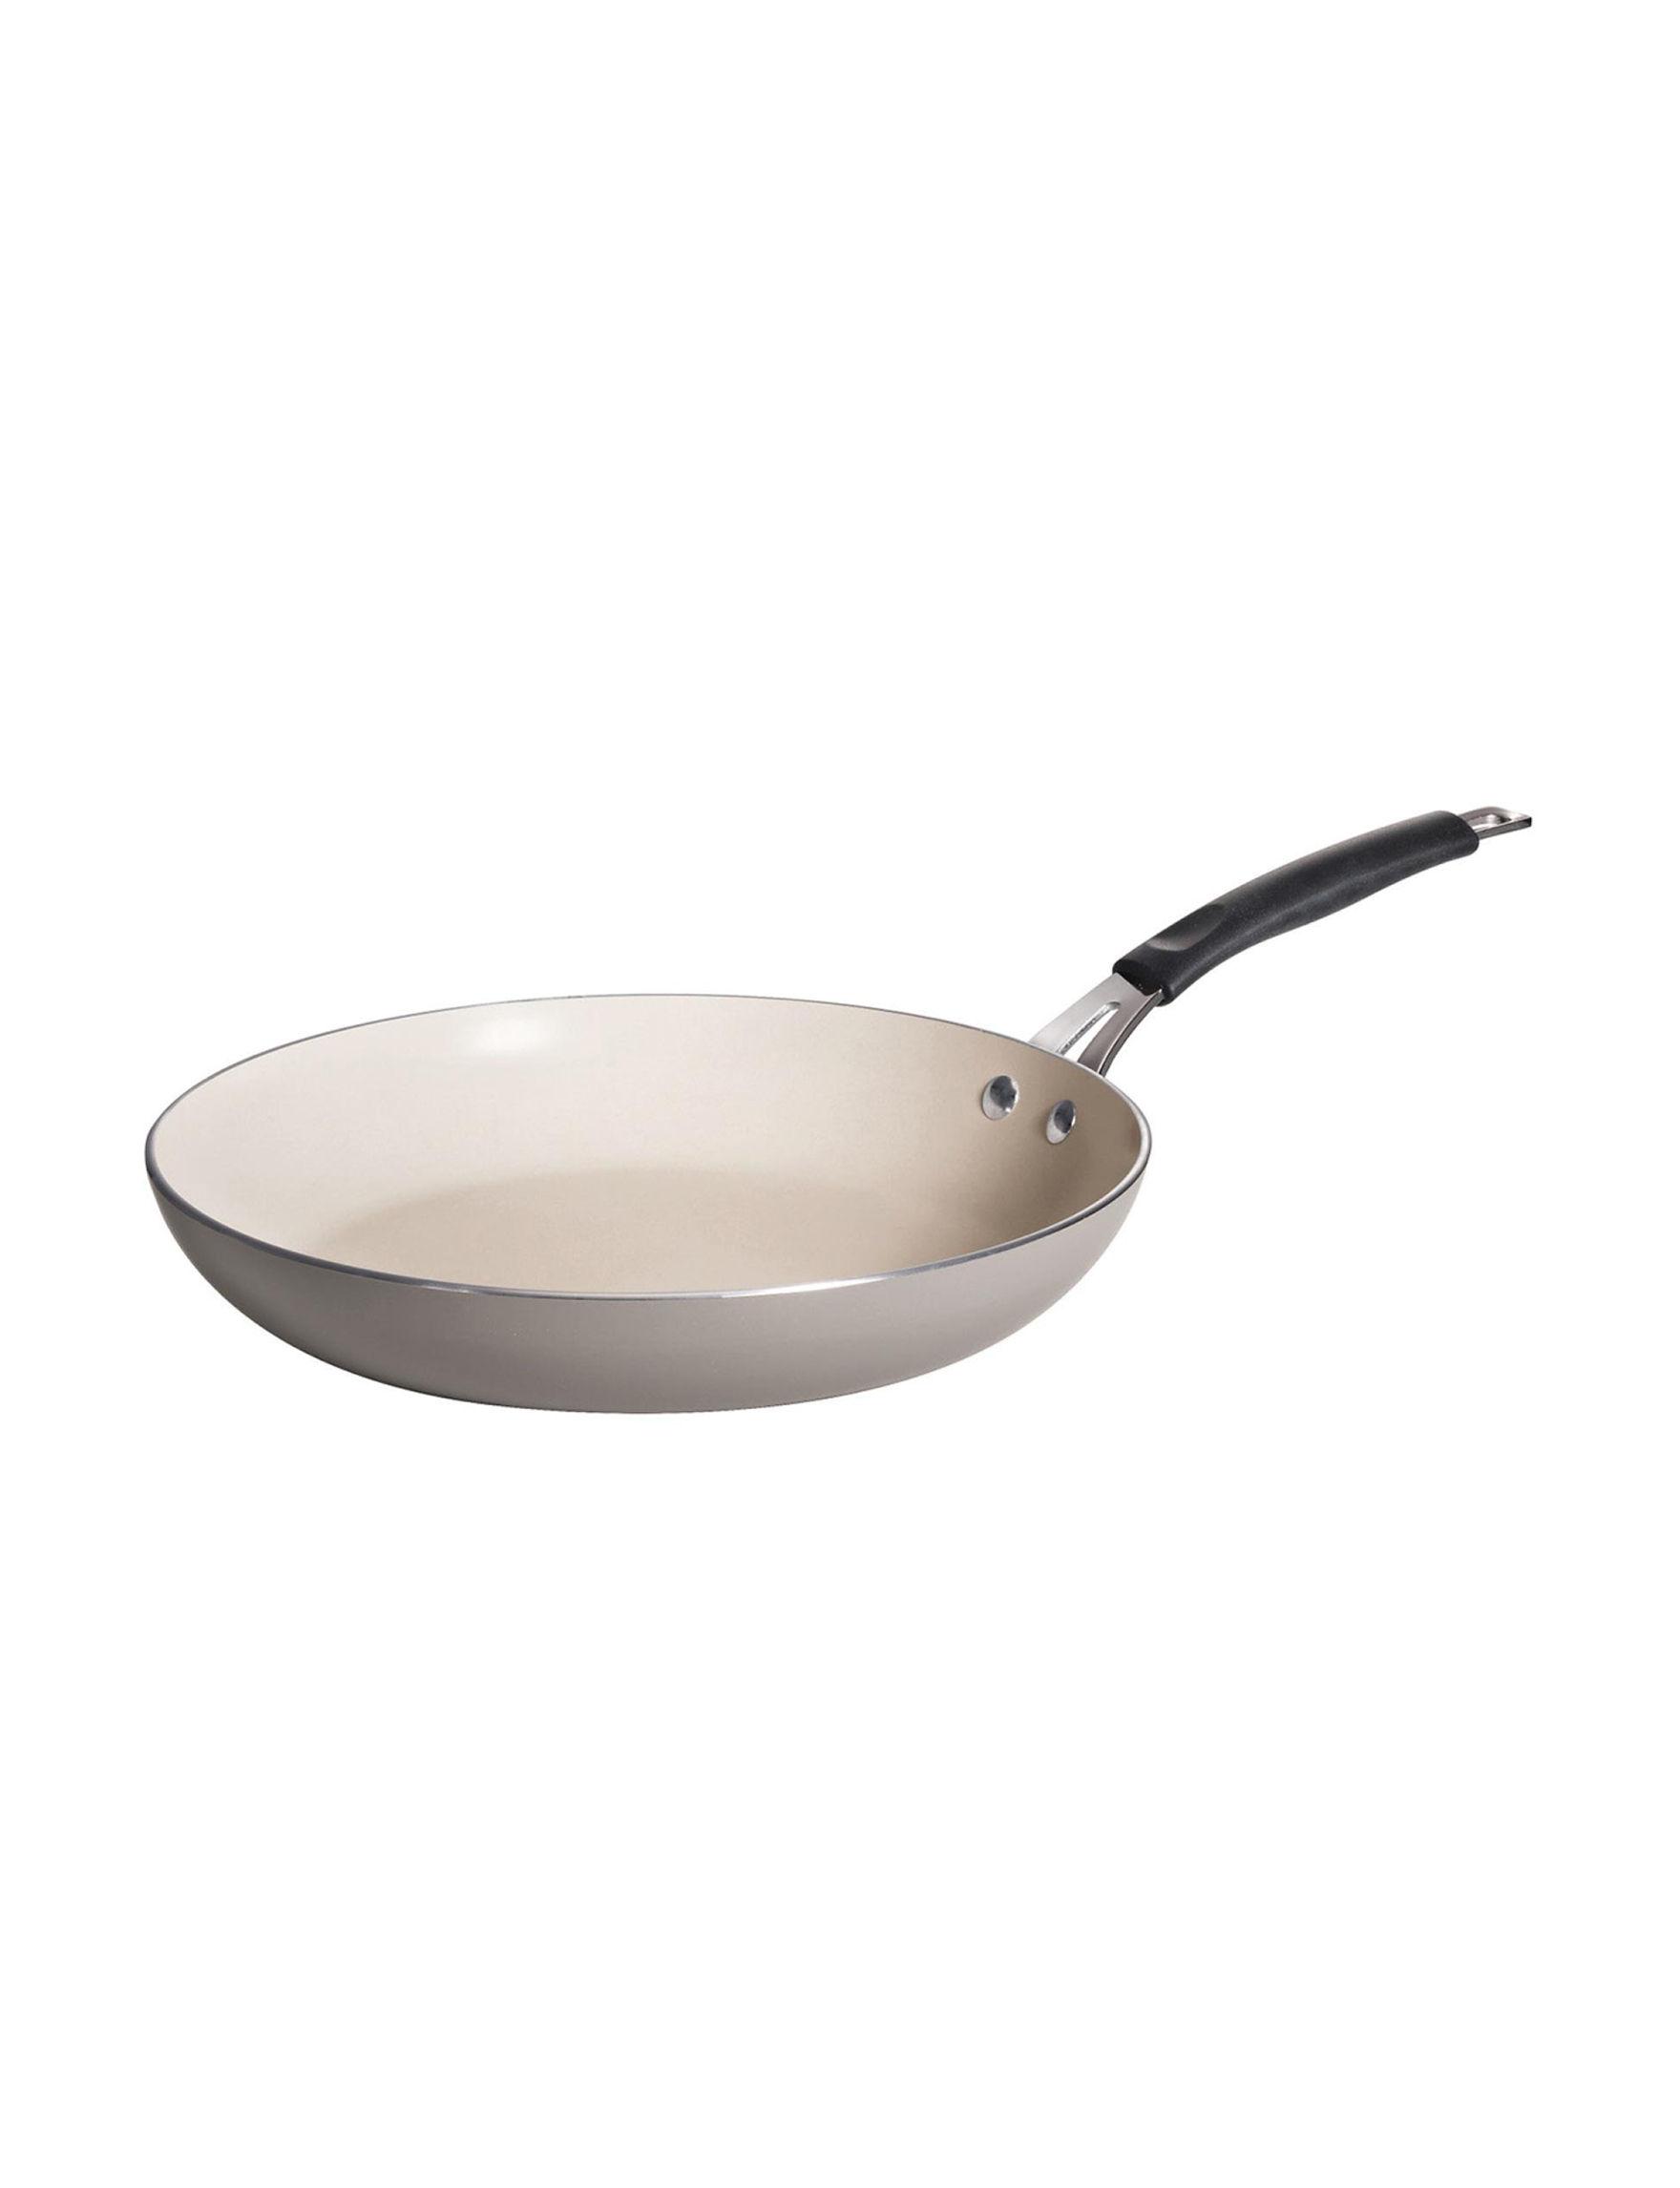 Tramontina Natural Frying Pans & Skillets Cookware